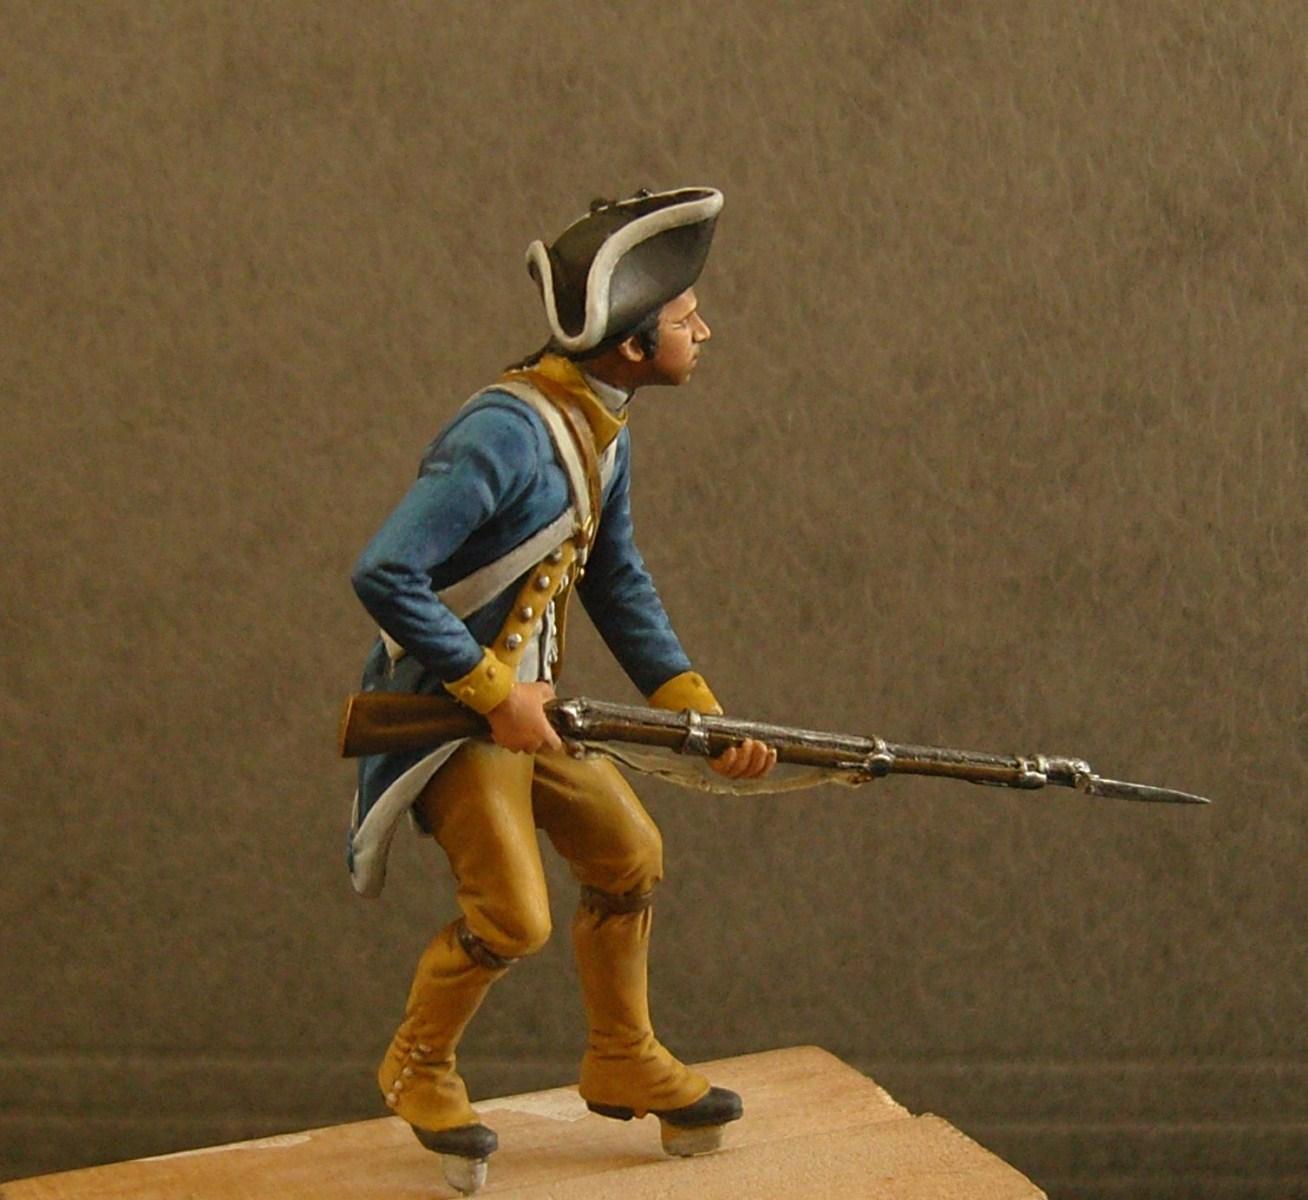 US Revolutionary Infantryman, 1780 - Page 7 120226033338699799494554